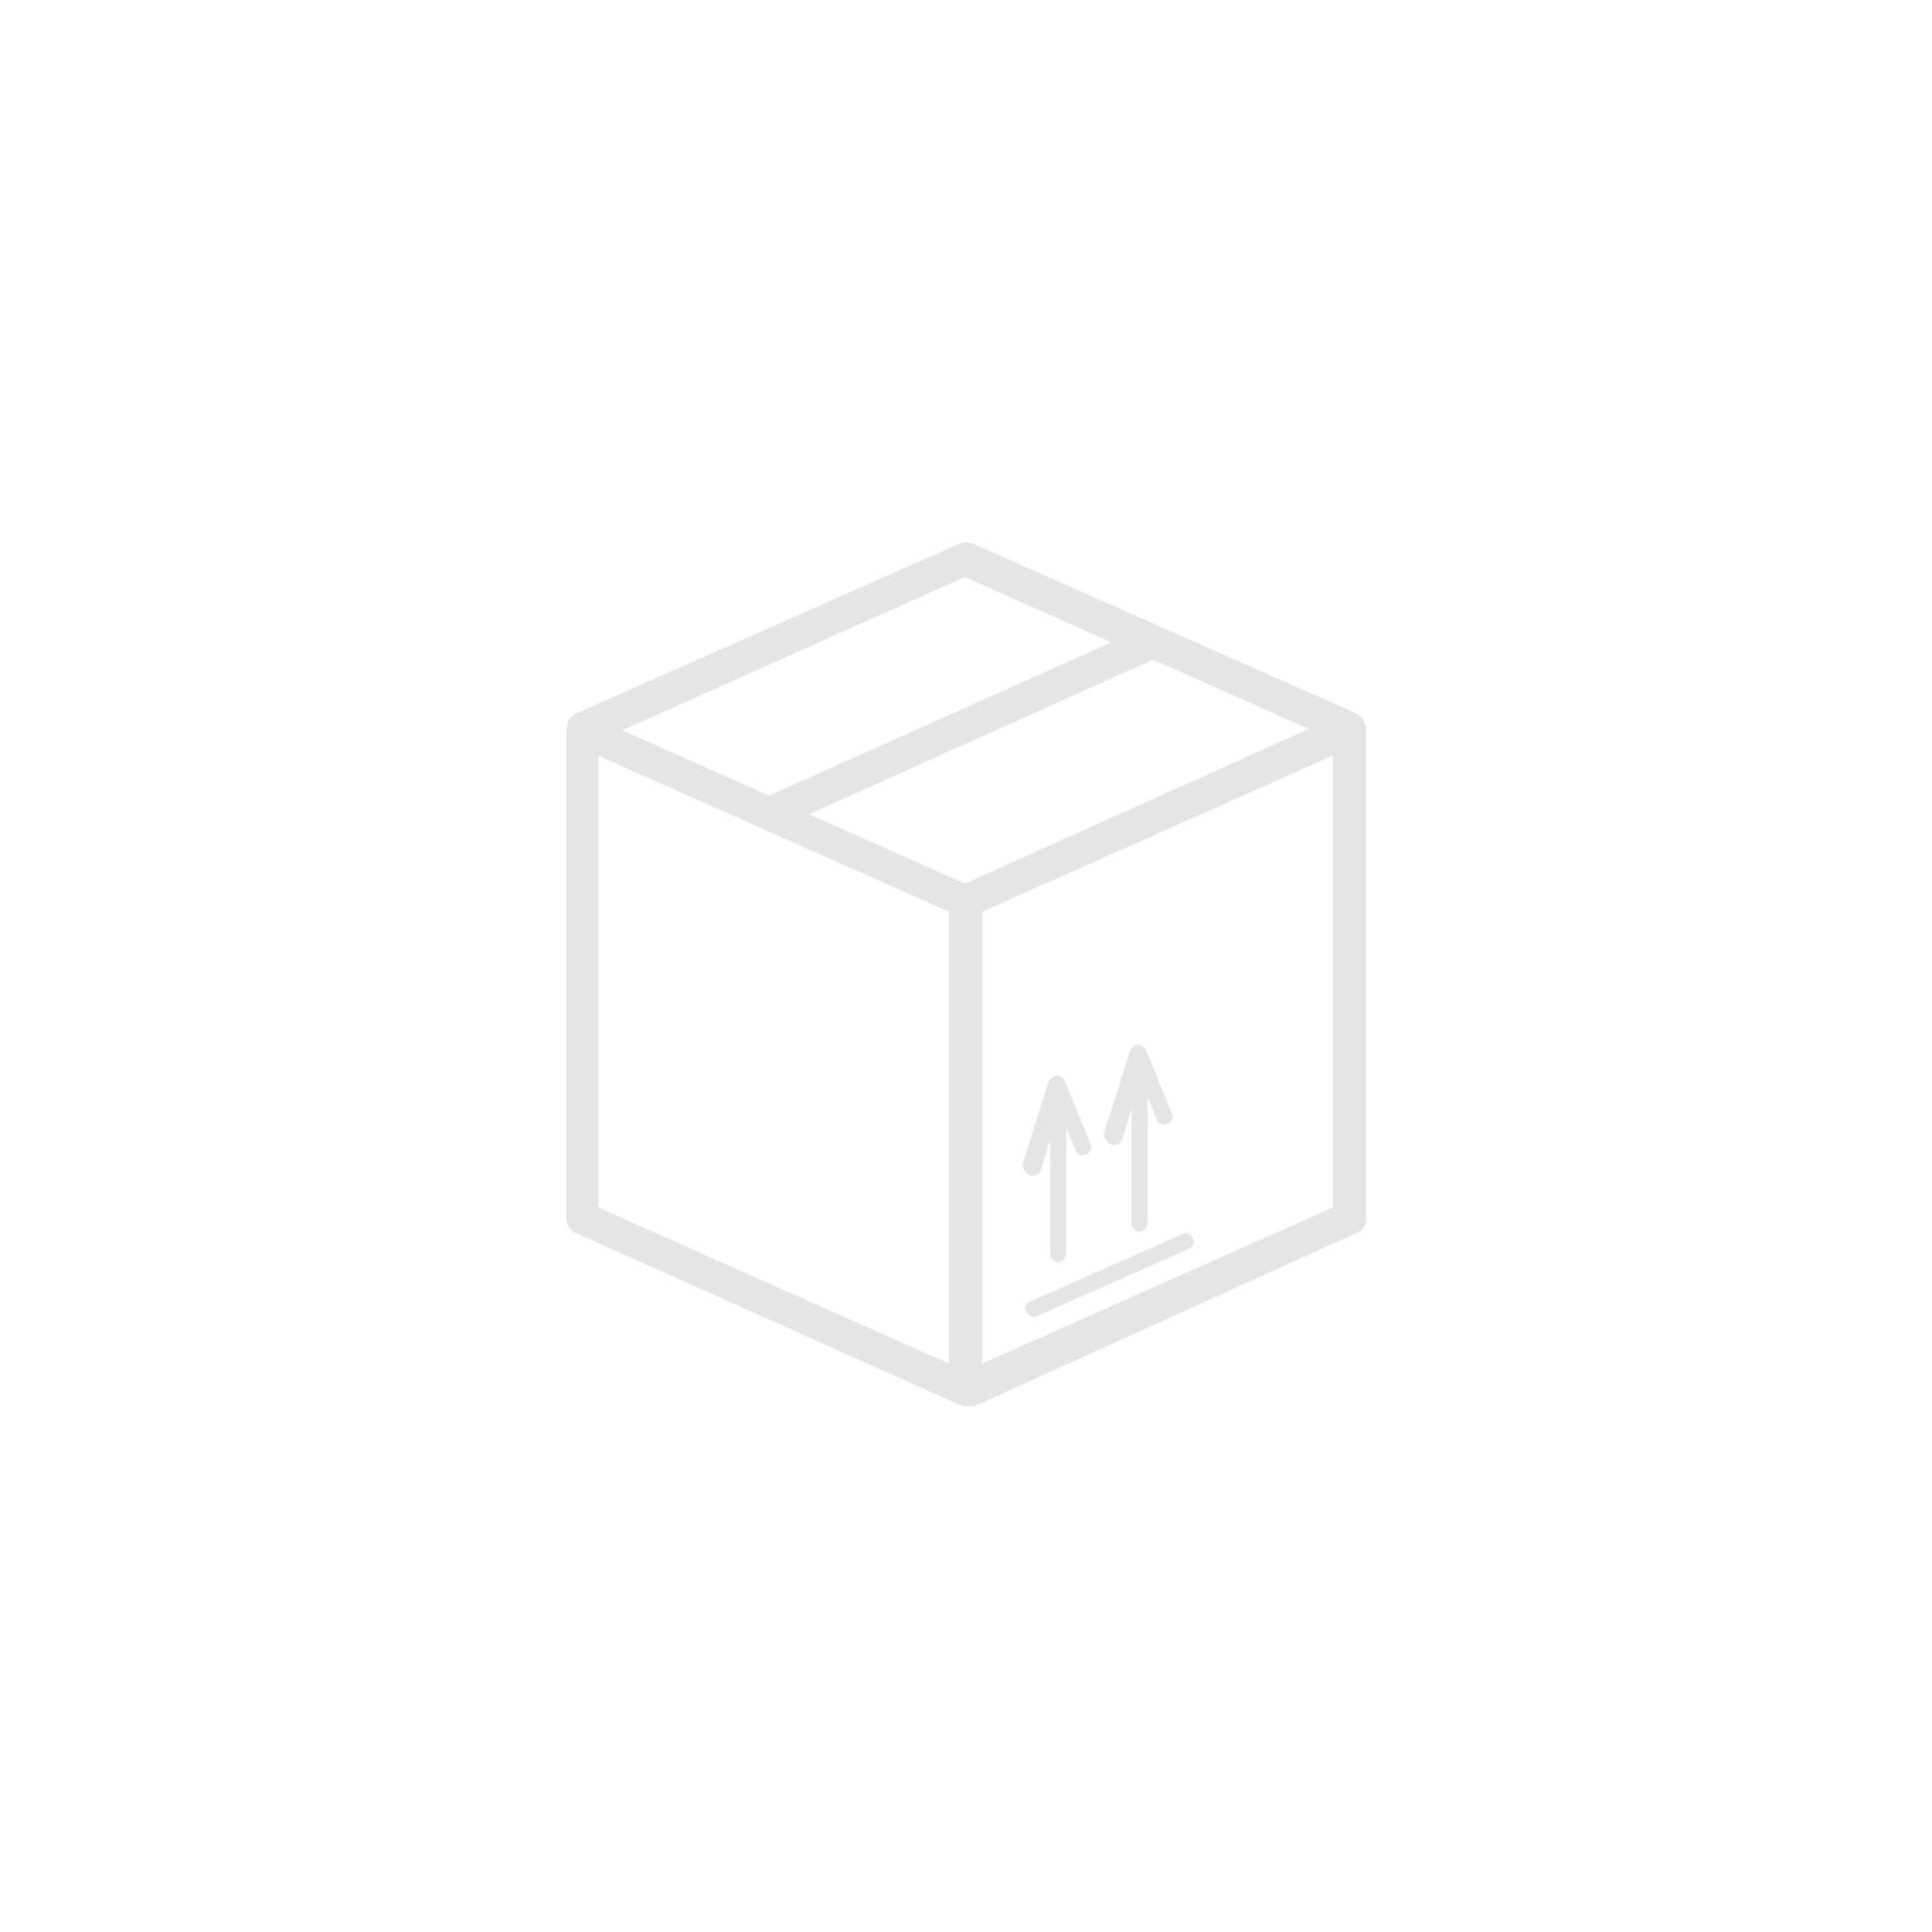 MCLED Napaječ LED 12V/8,3A ML-732.015.10.0